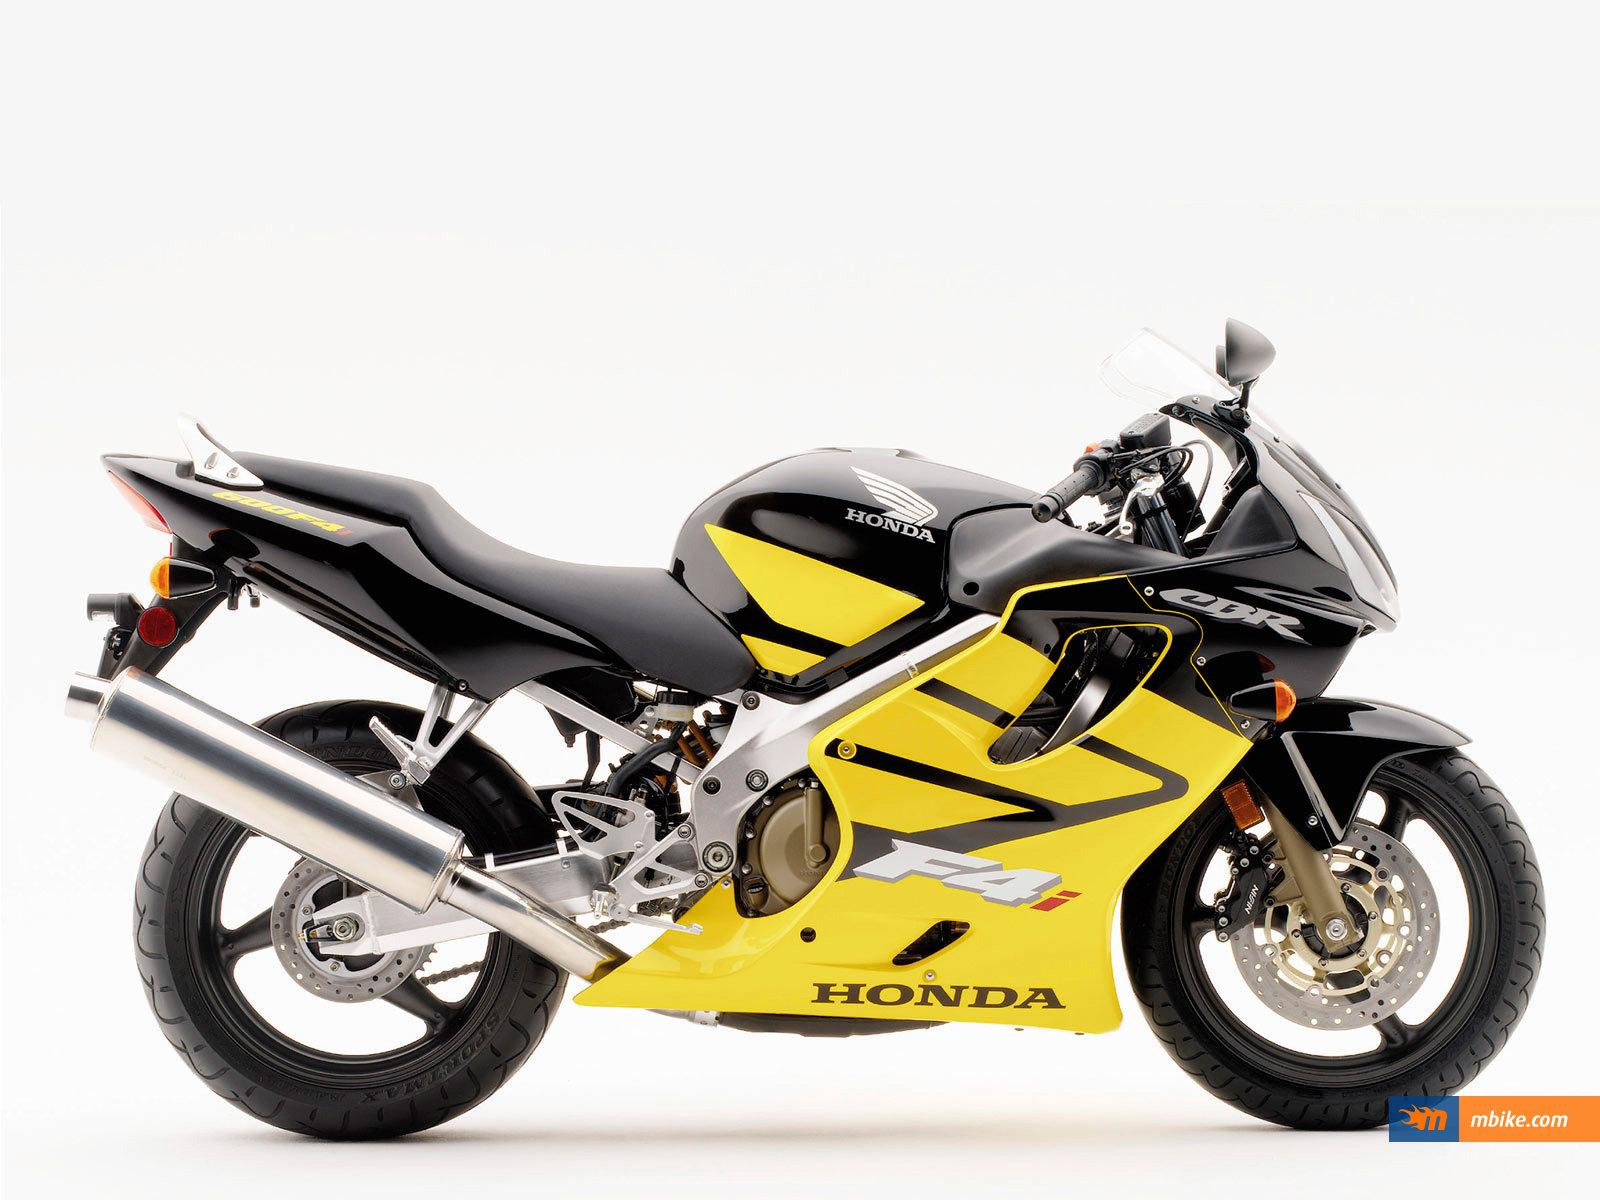 2005 Honda Cbr 600 F Wallpaper Mbike Com